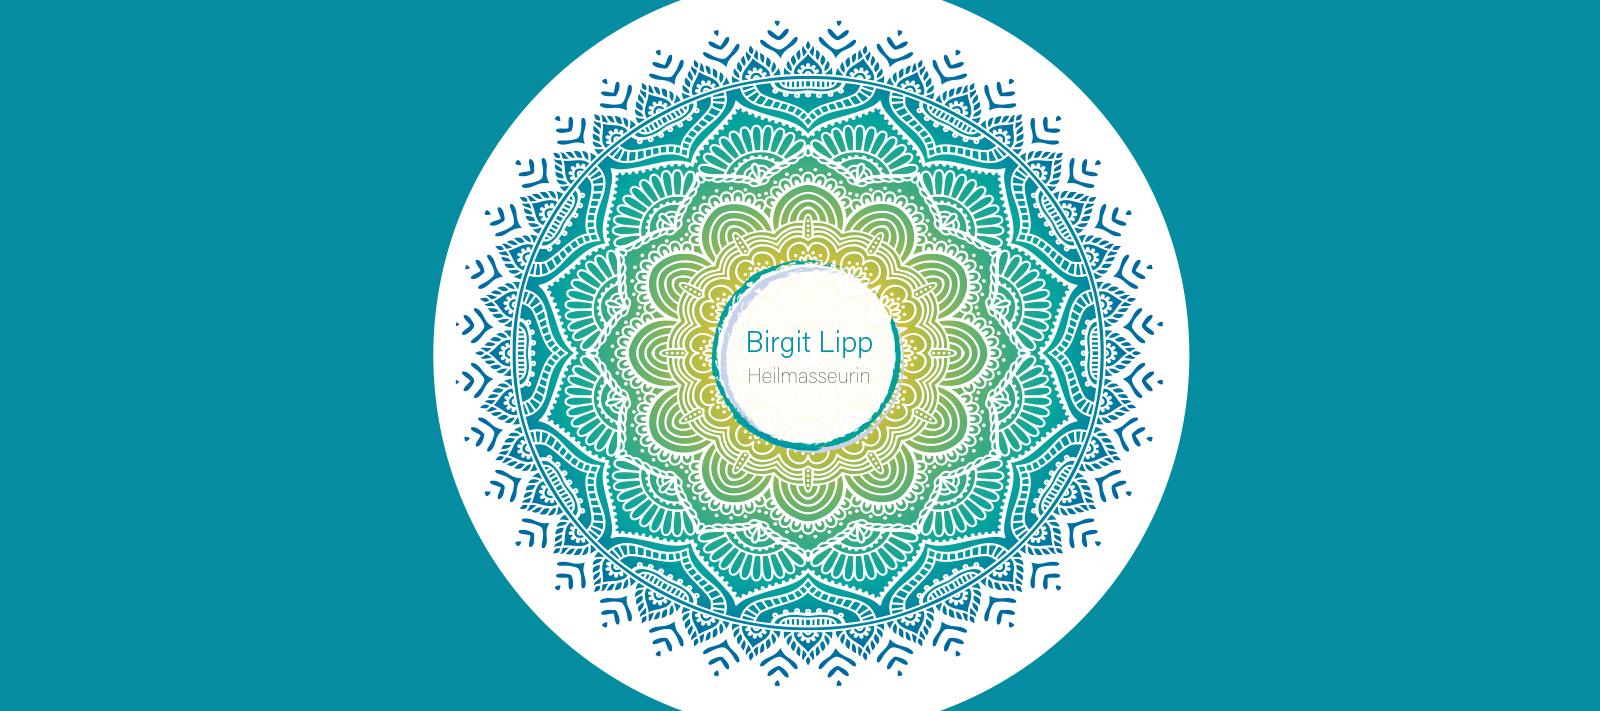 Logo Birgit Lipp Heilmasseurin